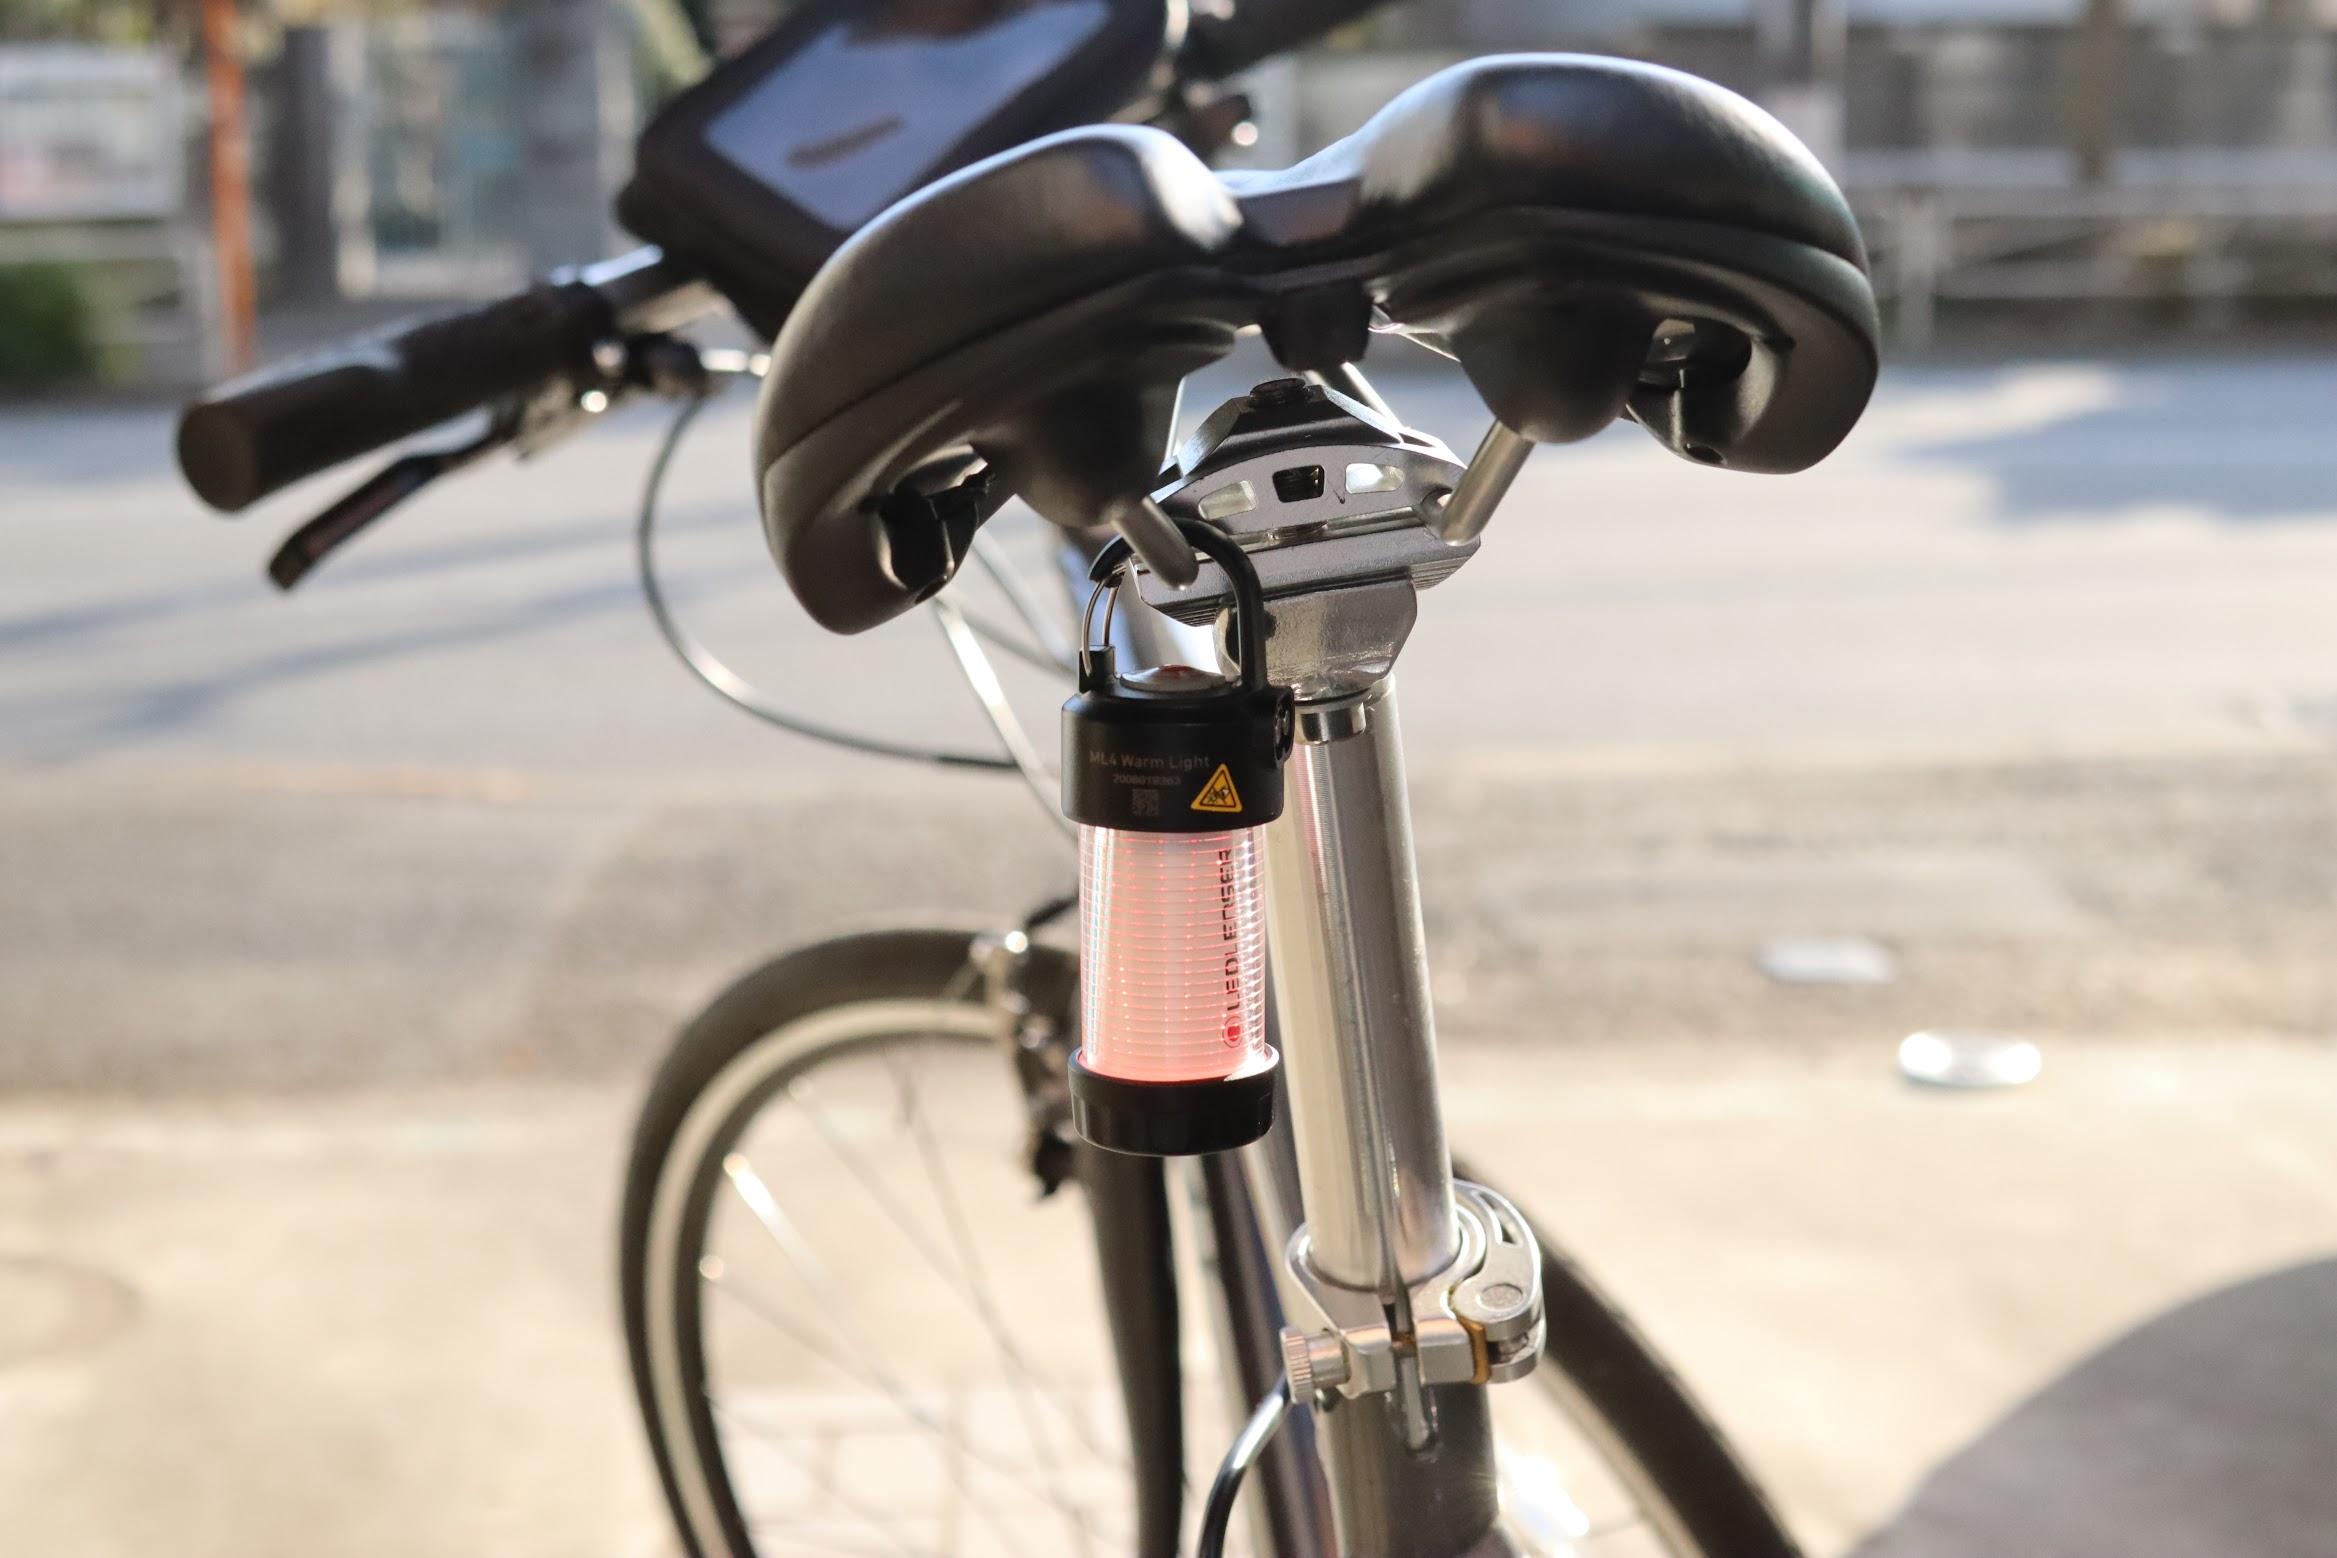 LEDLENSER(レッドレンザー)社 ML4 自転車 テールランプ